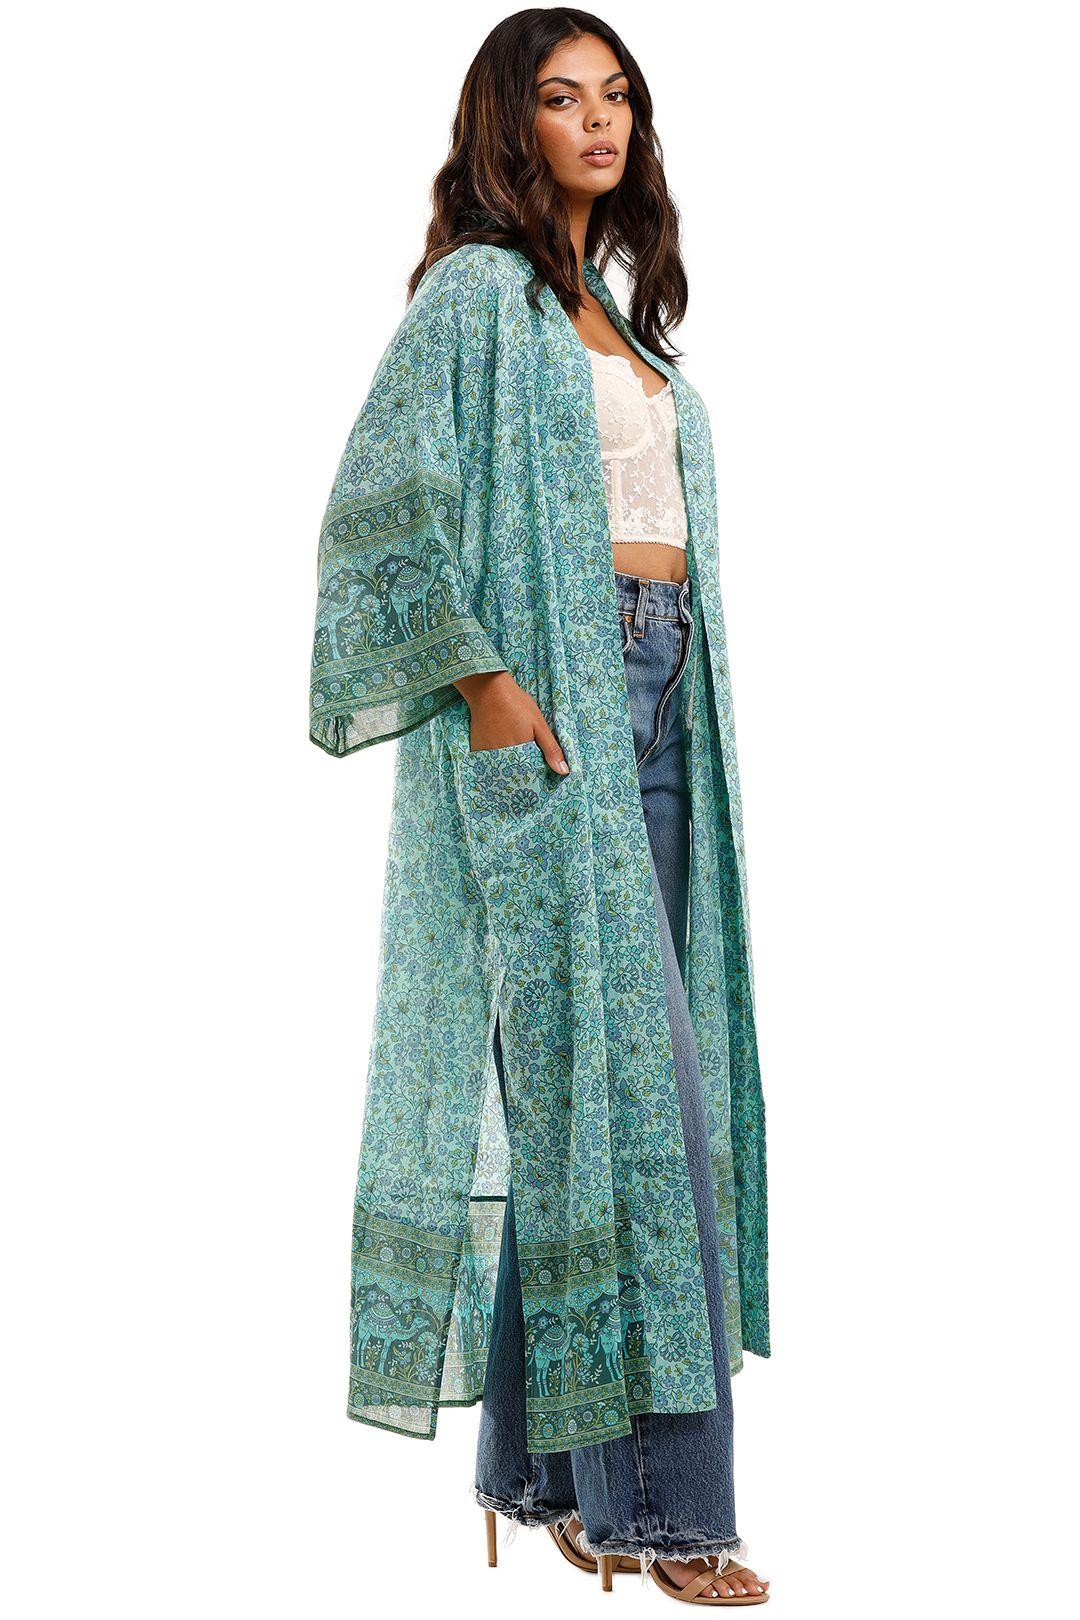 Spell Sundown Maxi Robe Turquoise Boho